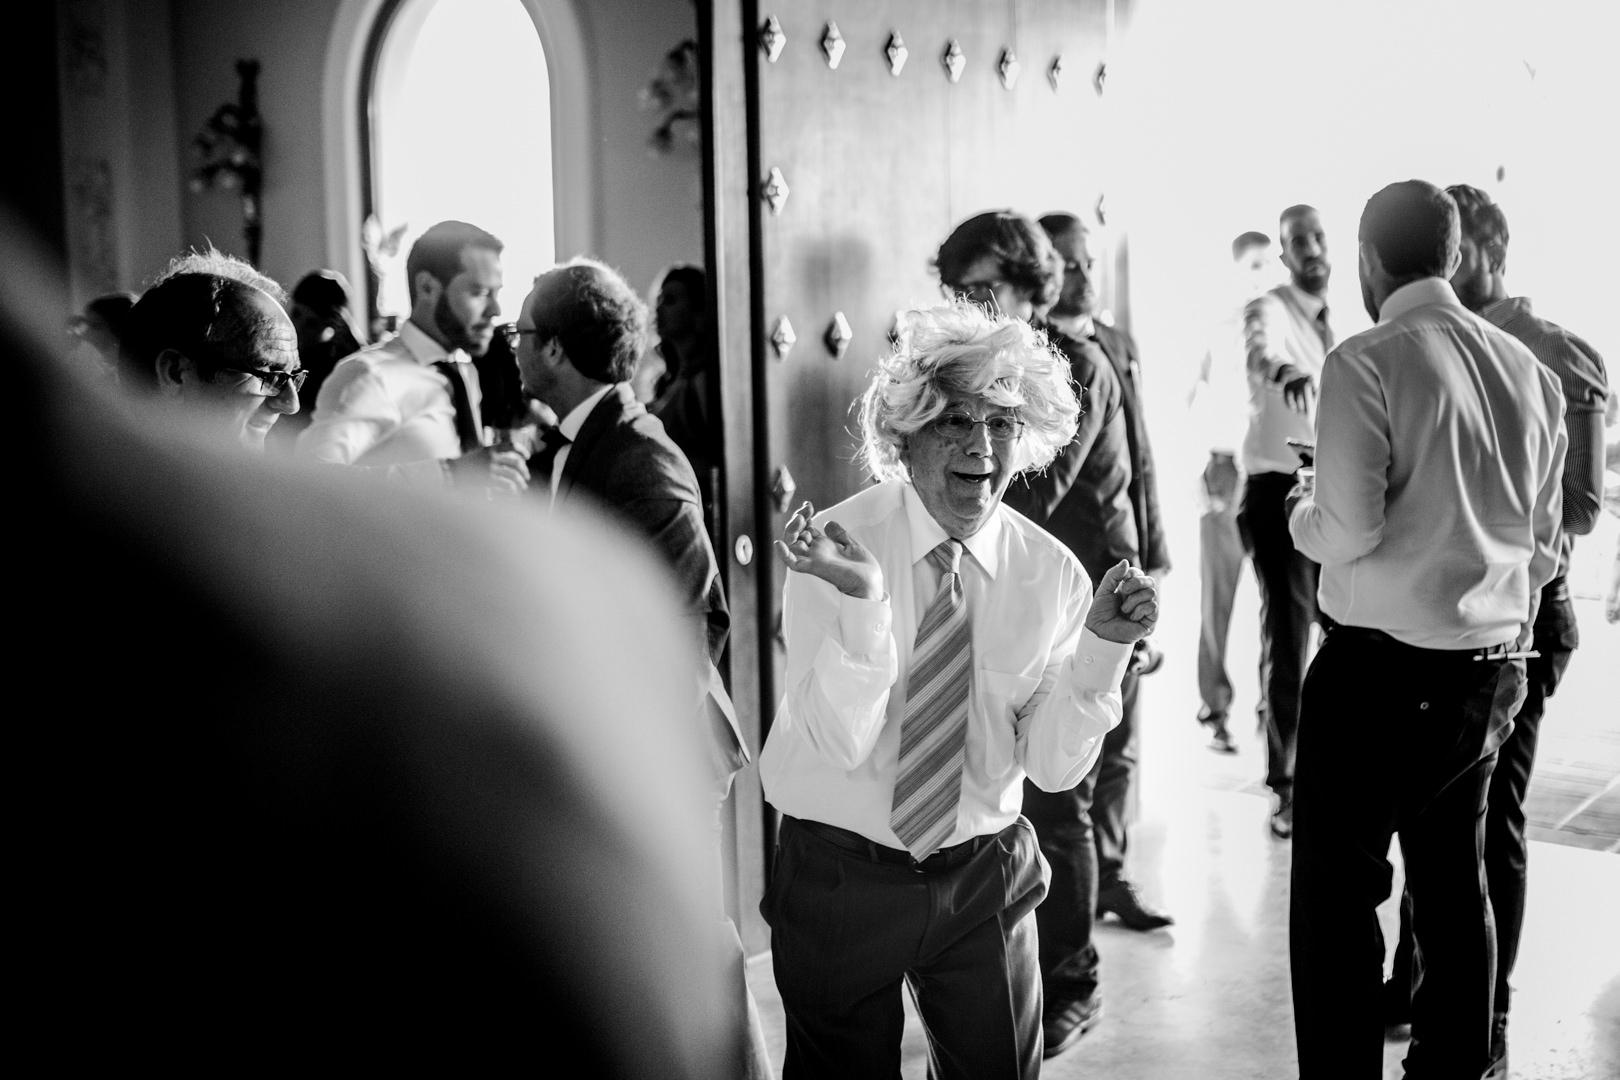 Boda-Catedral-Jaen-Hamburgo-Maria-David-engagement-Rafael-Torres-fotografo-bodas-sevilla-madrid-barcelona-wedding-photographer--41.jpg